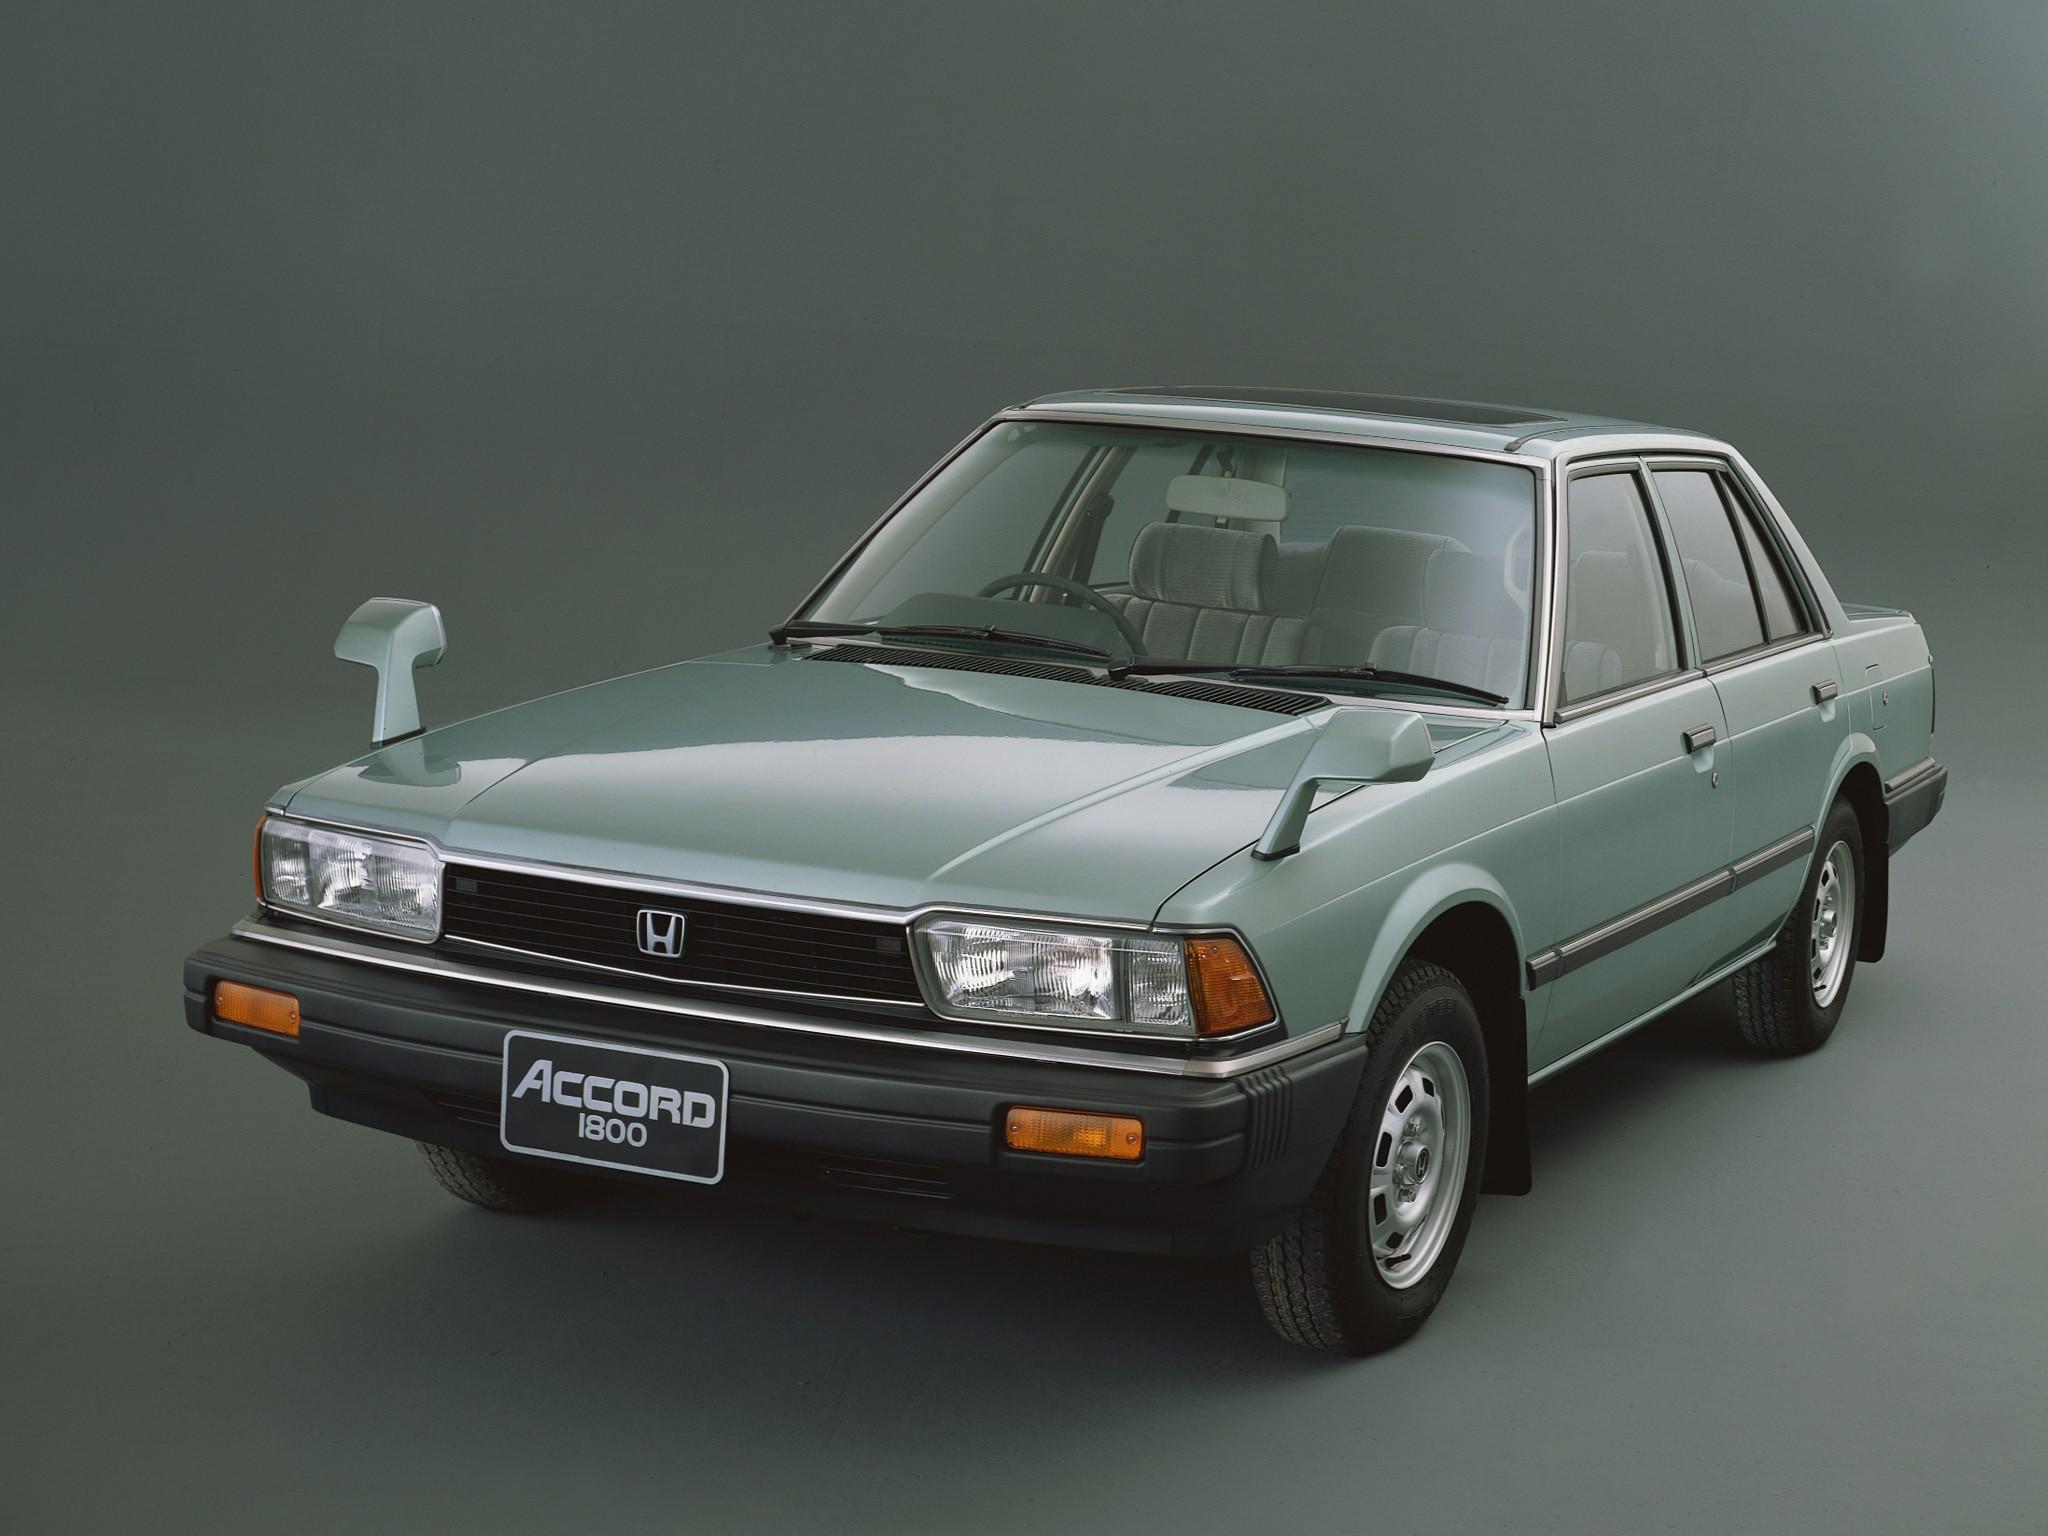 HONDA Accord 4 Doors specs & photos - 1981, 1982, 1983, 1984, 1985 - autoevolution